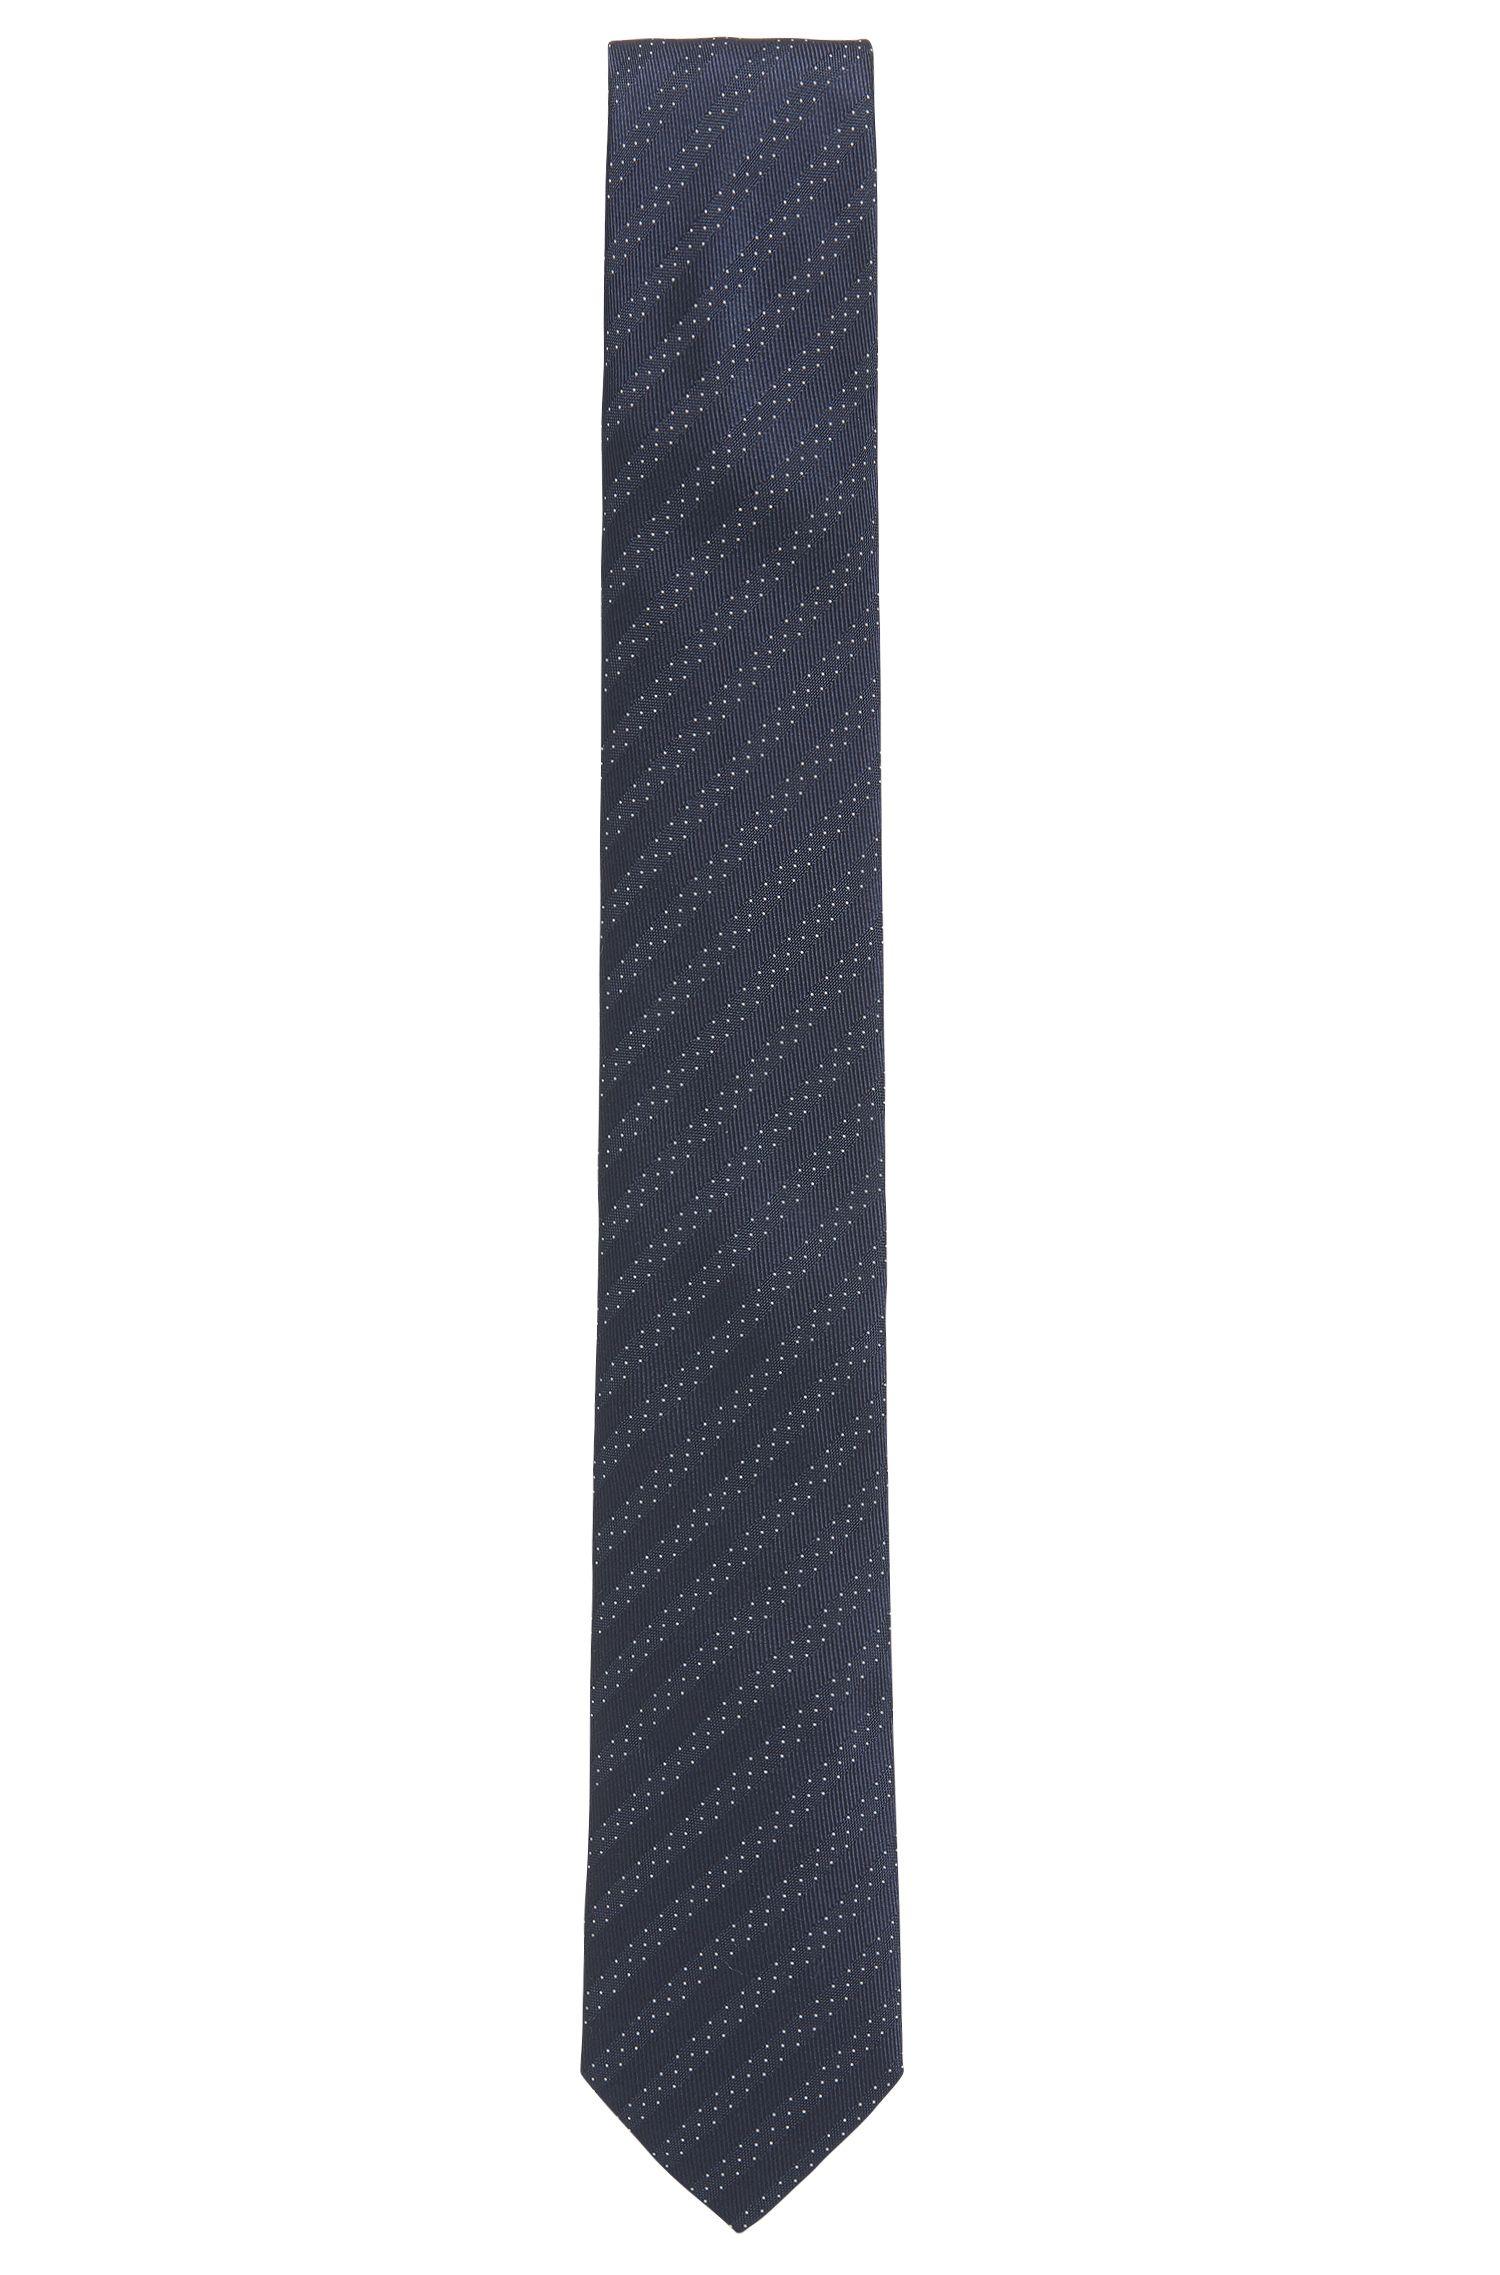 Contrast micro-pattern tie in silk jacquard